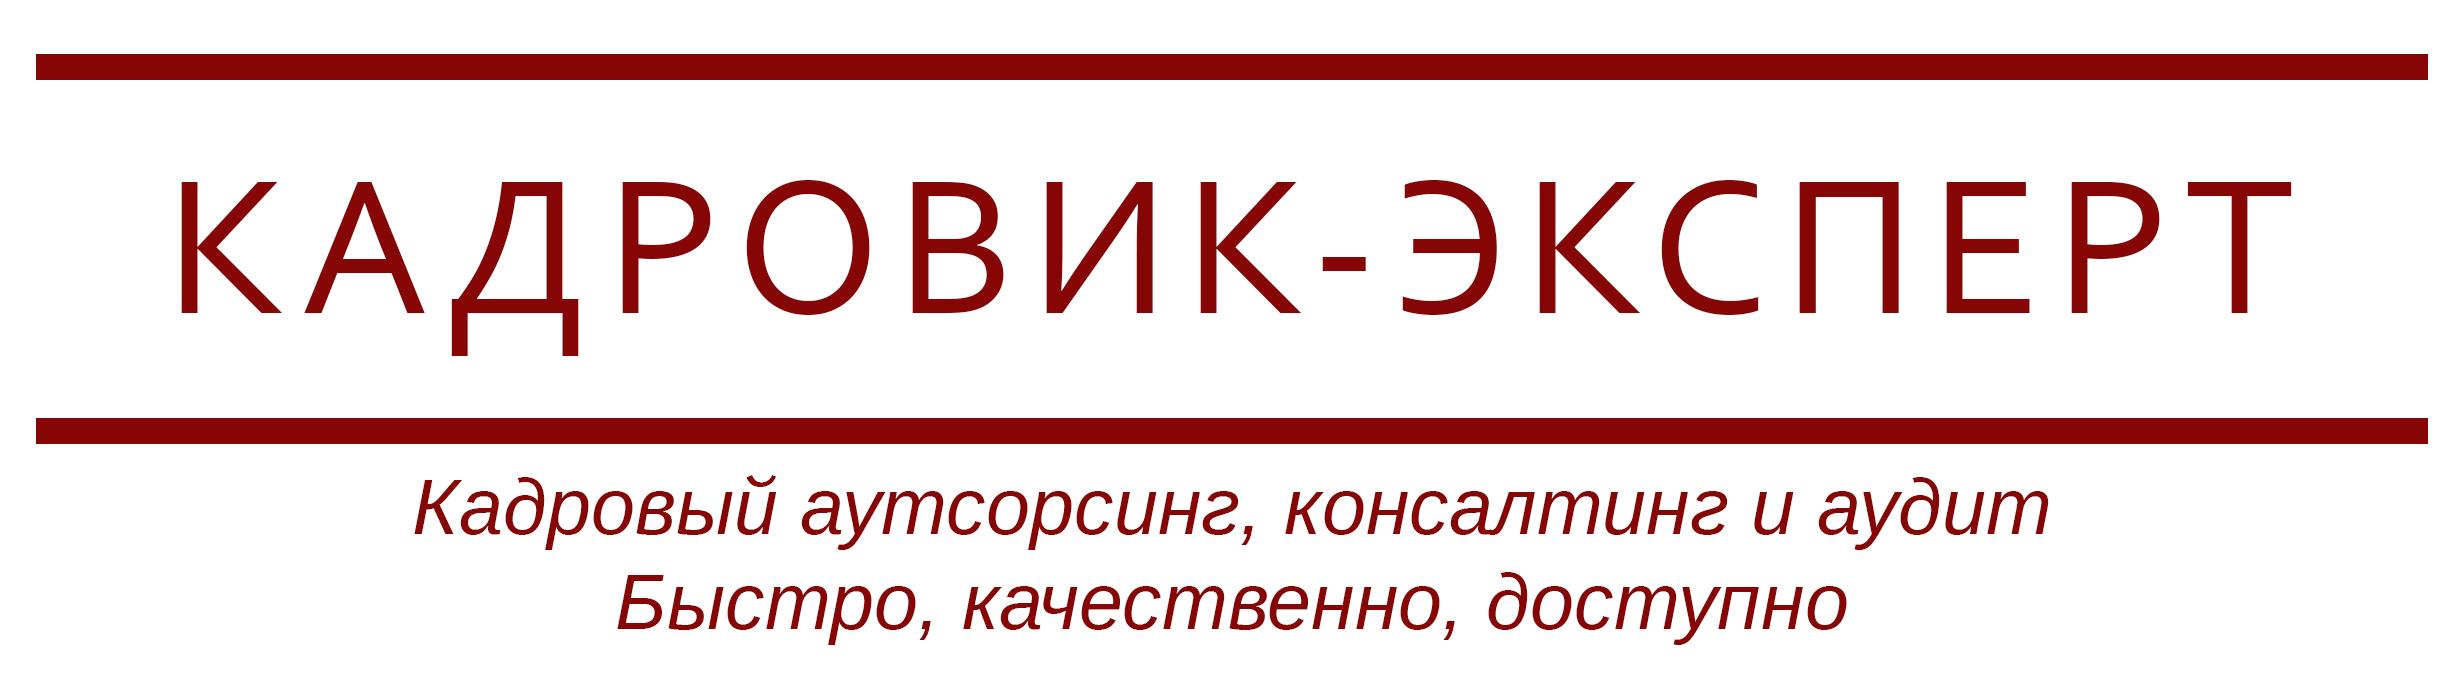 kadrovik-expert.ru